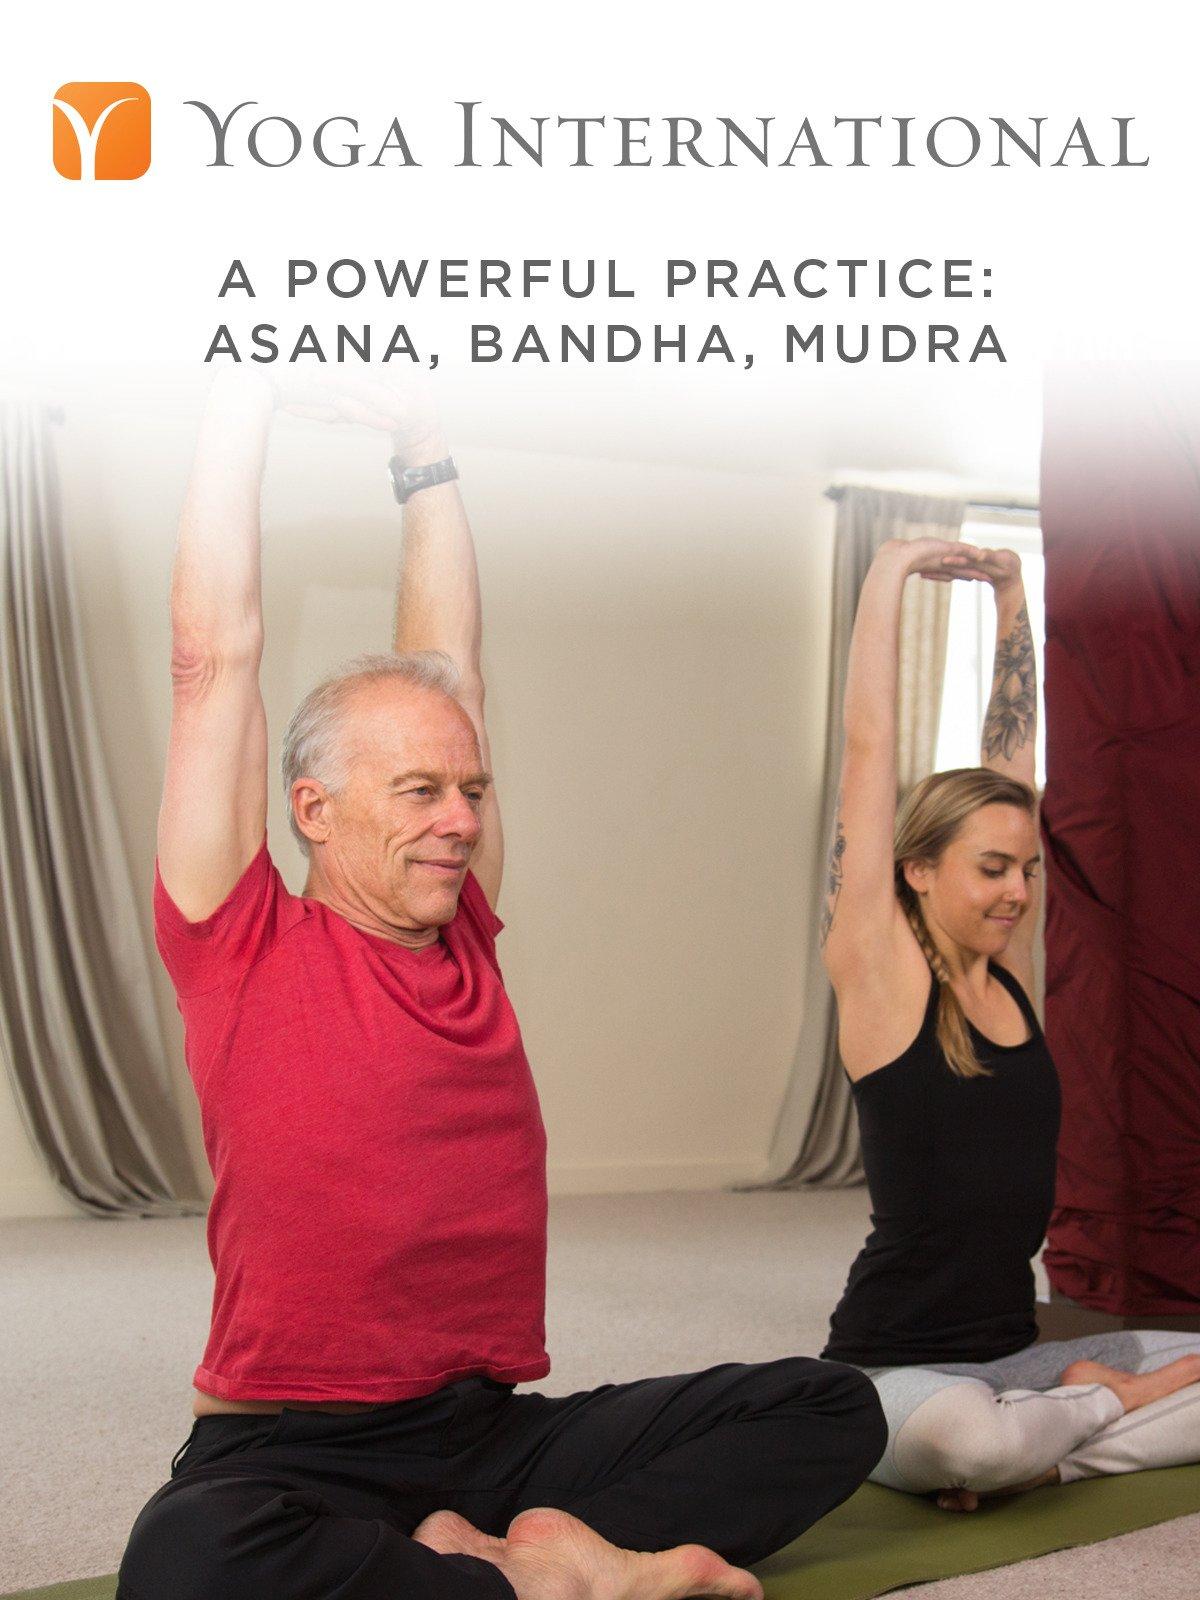 A Powerful Practice: Asana, Bandha, Mudra